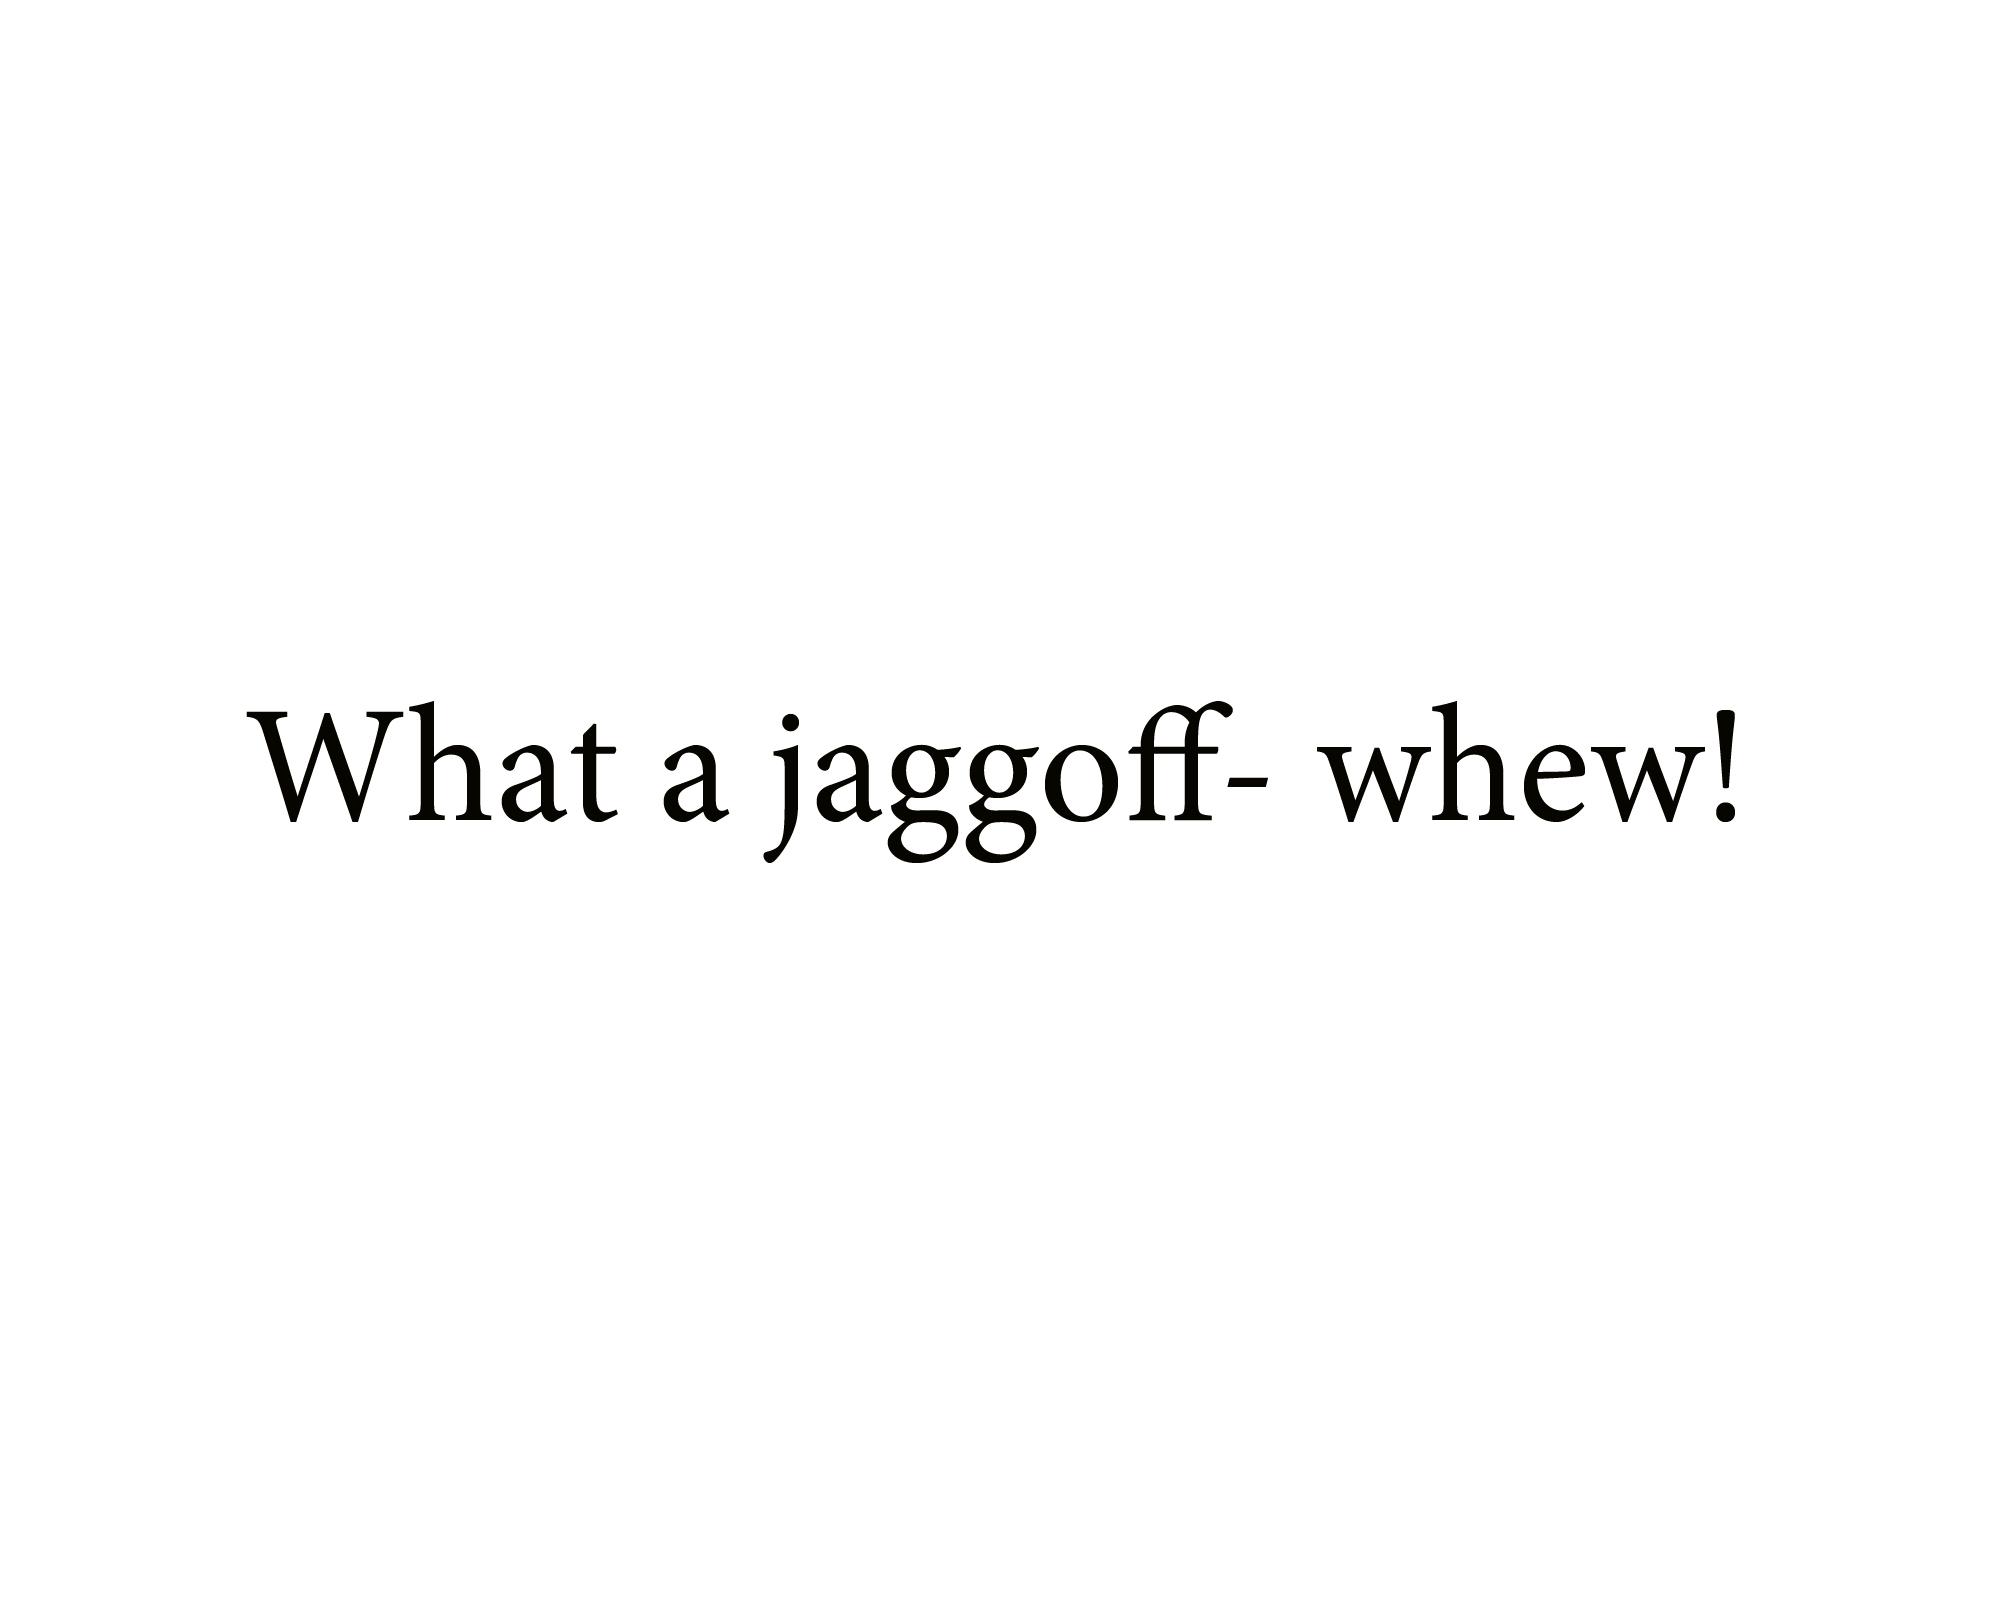 jaggoff.jpg